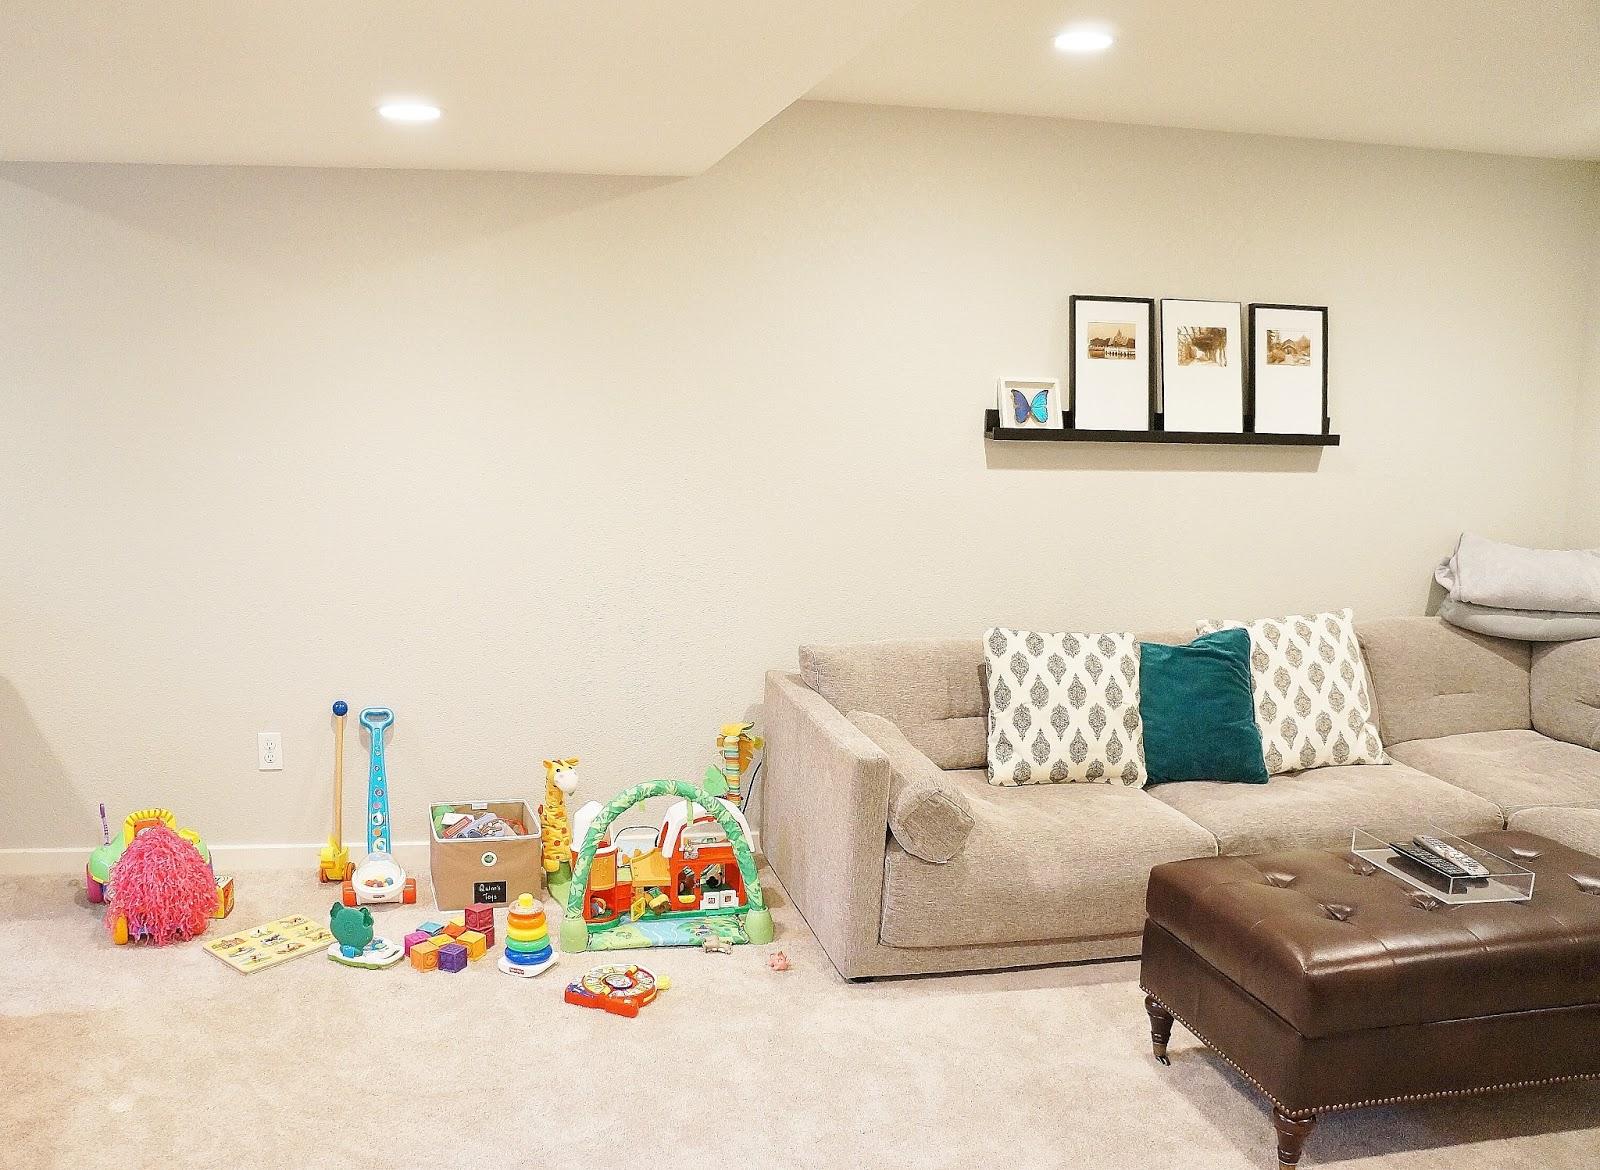 Benjamin moore colors for basement - Basement Family Room Play Area Work In Progress